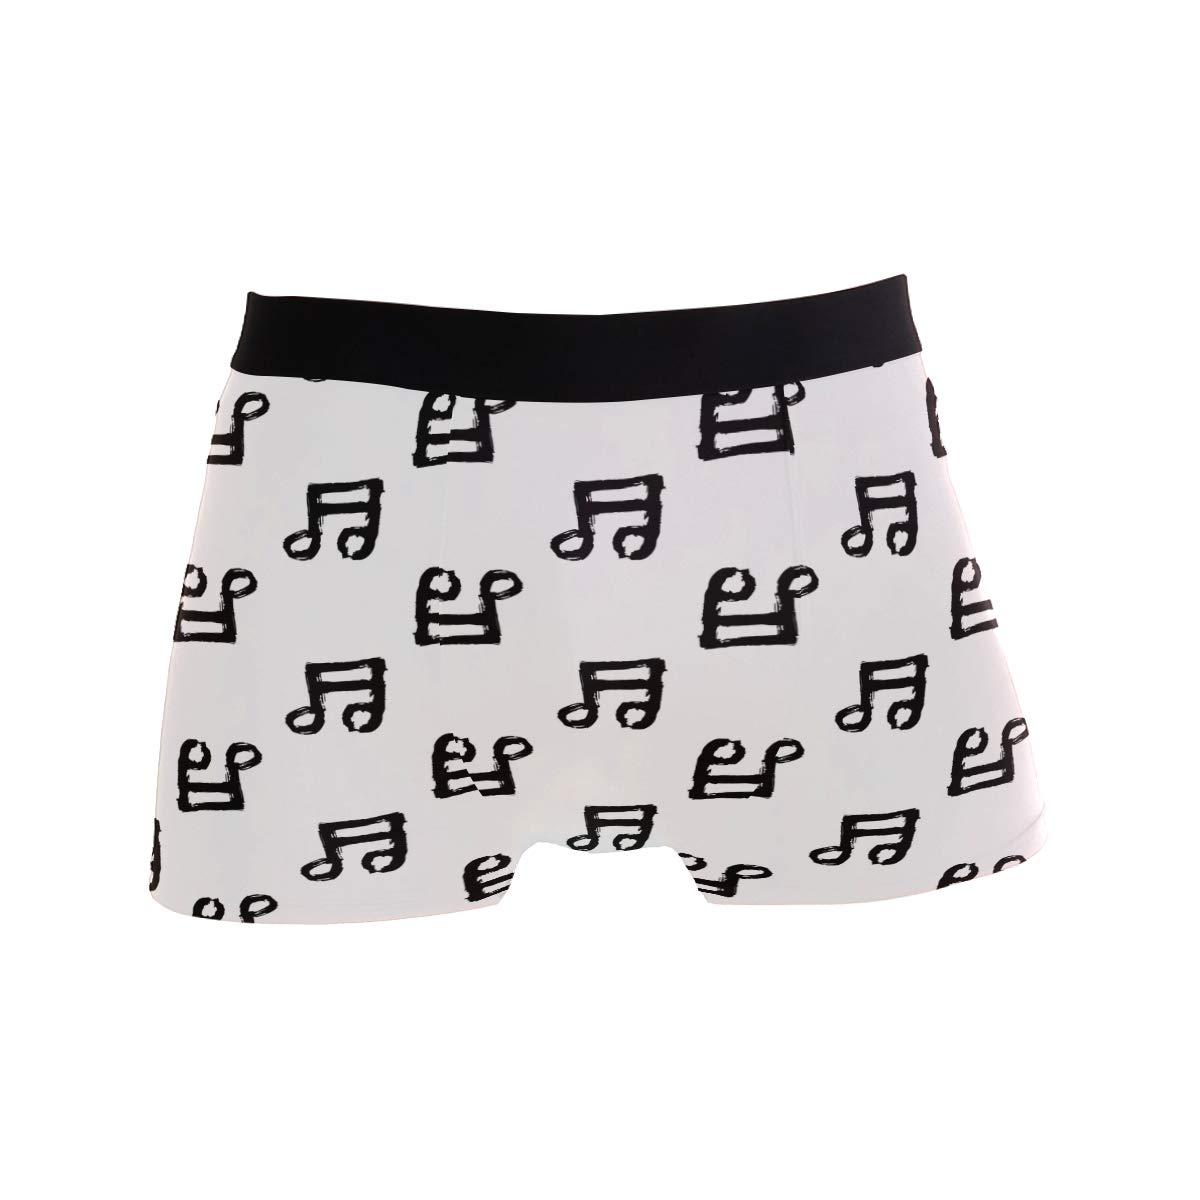 ZZKKO Music Note Mens Boxer Briefs Underwear Breathable Stretch Boxer Trunk with Pouch S-XL